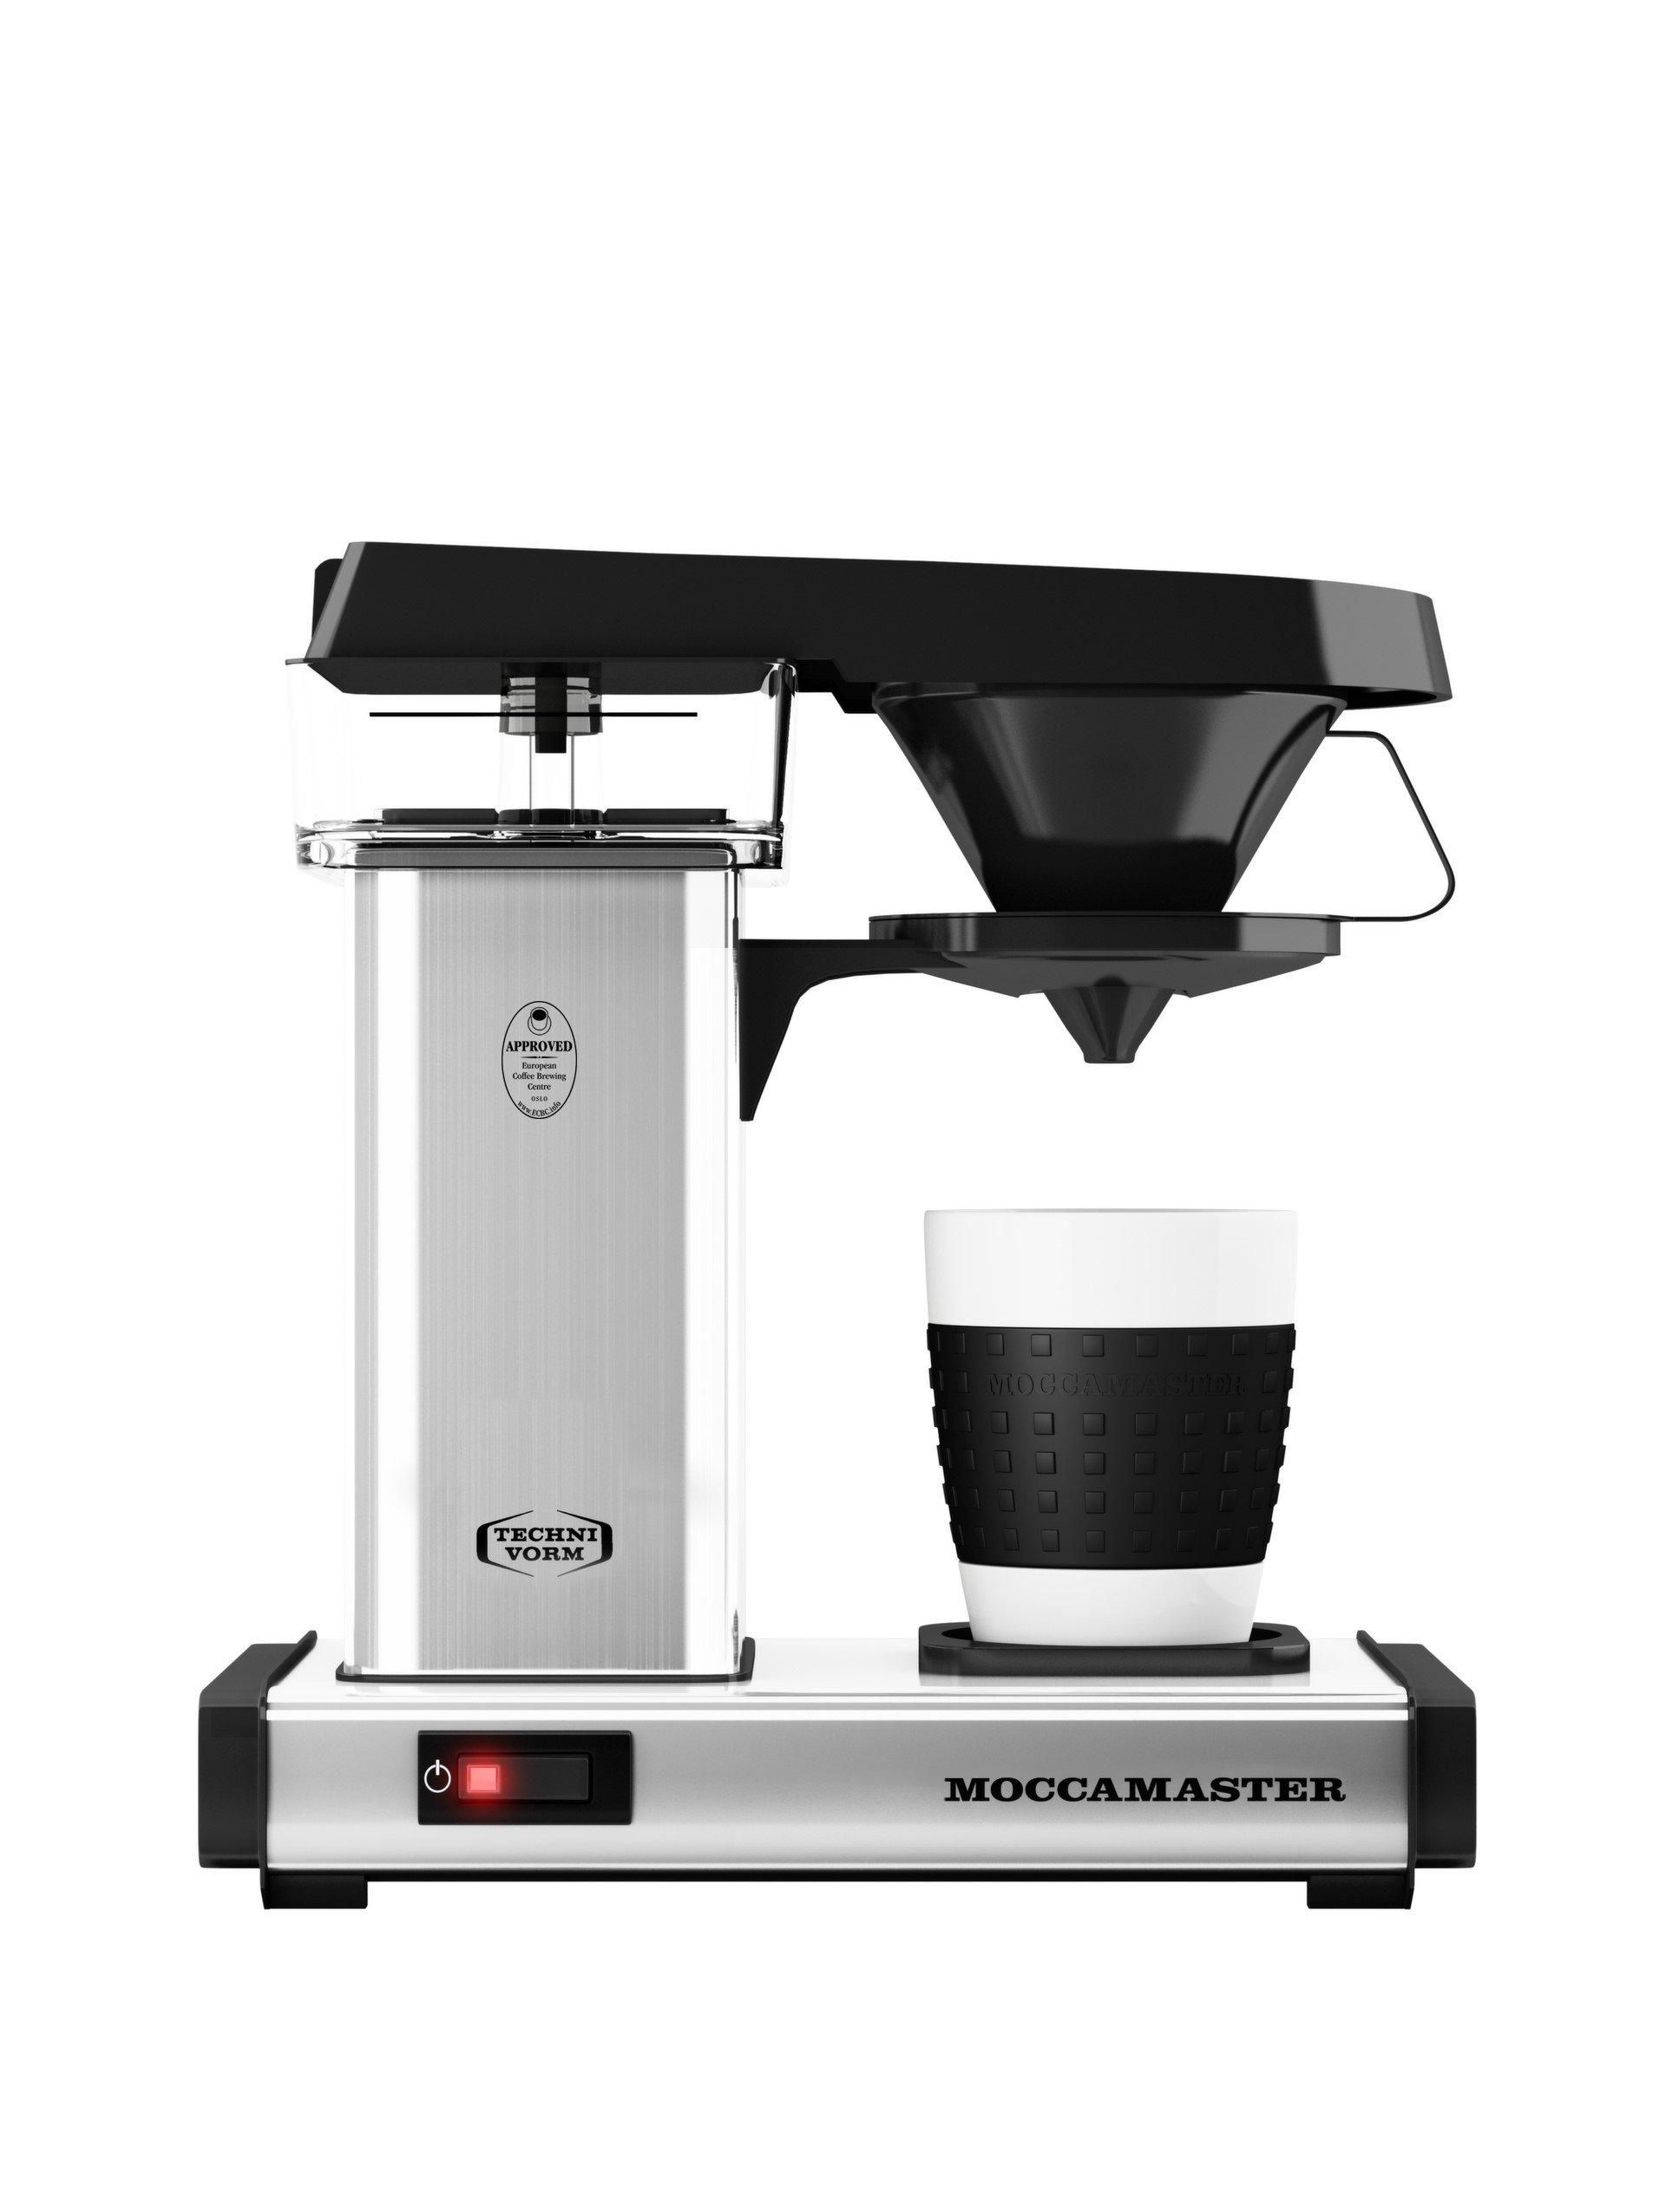 Technivorm Moccamaster 69212 Coffee Brewer, 10 oz, Polished Silver by Technivorm Moccamaster